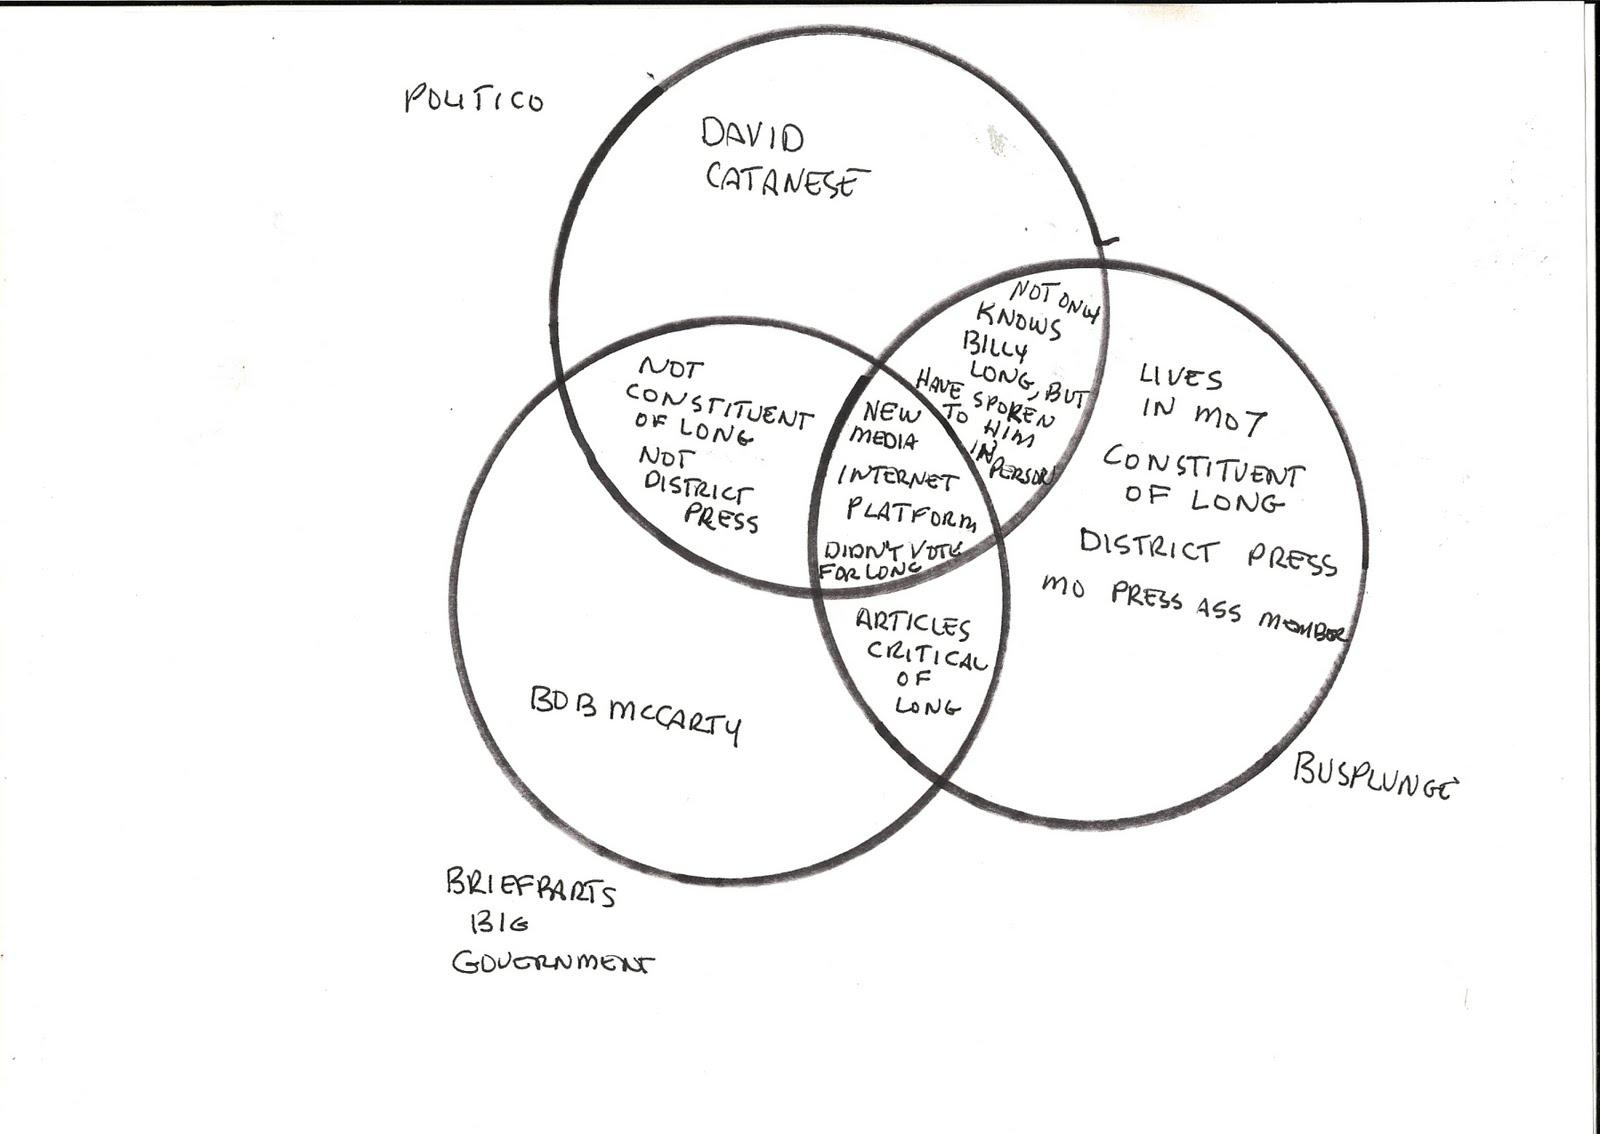 House Vs Senate Venn Diagram Indeed There Are Five Major